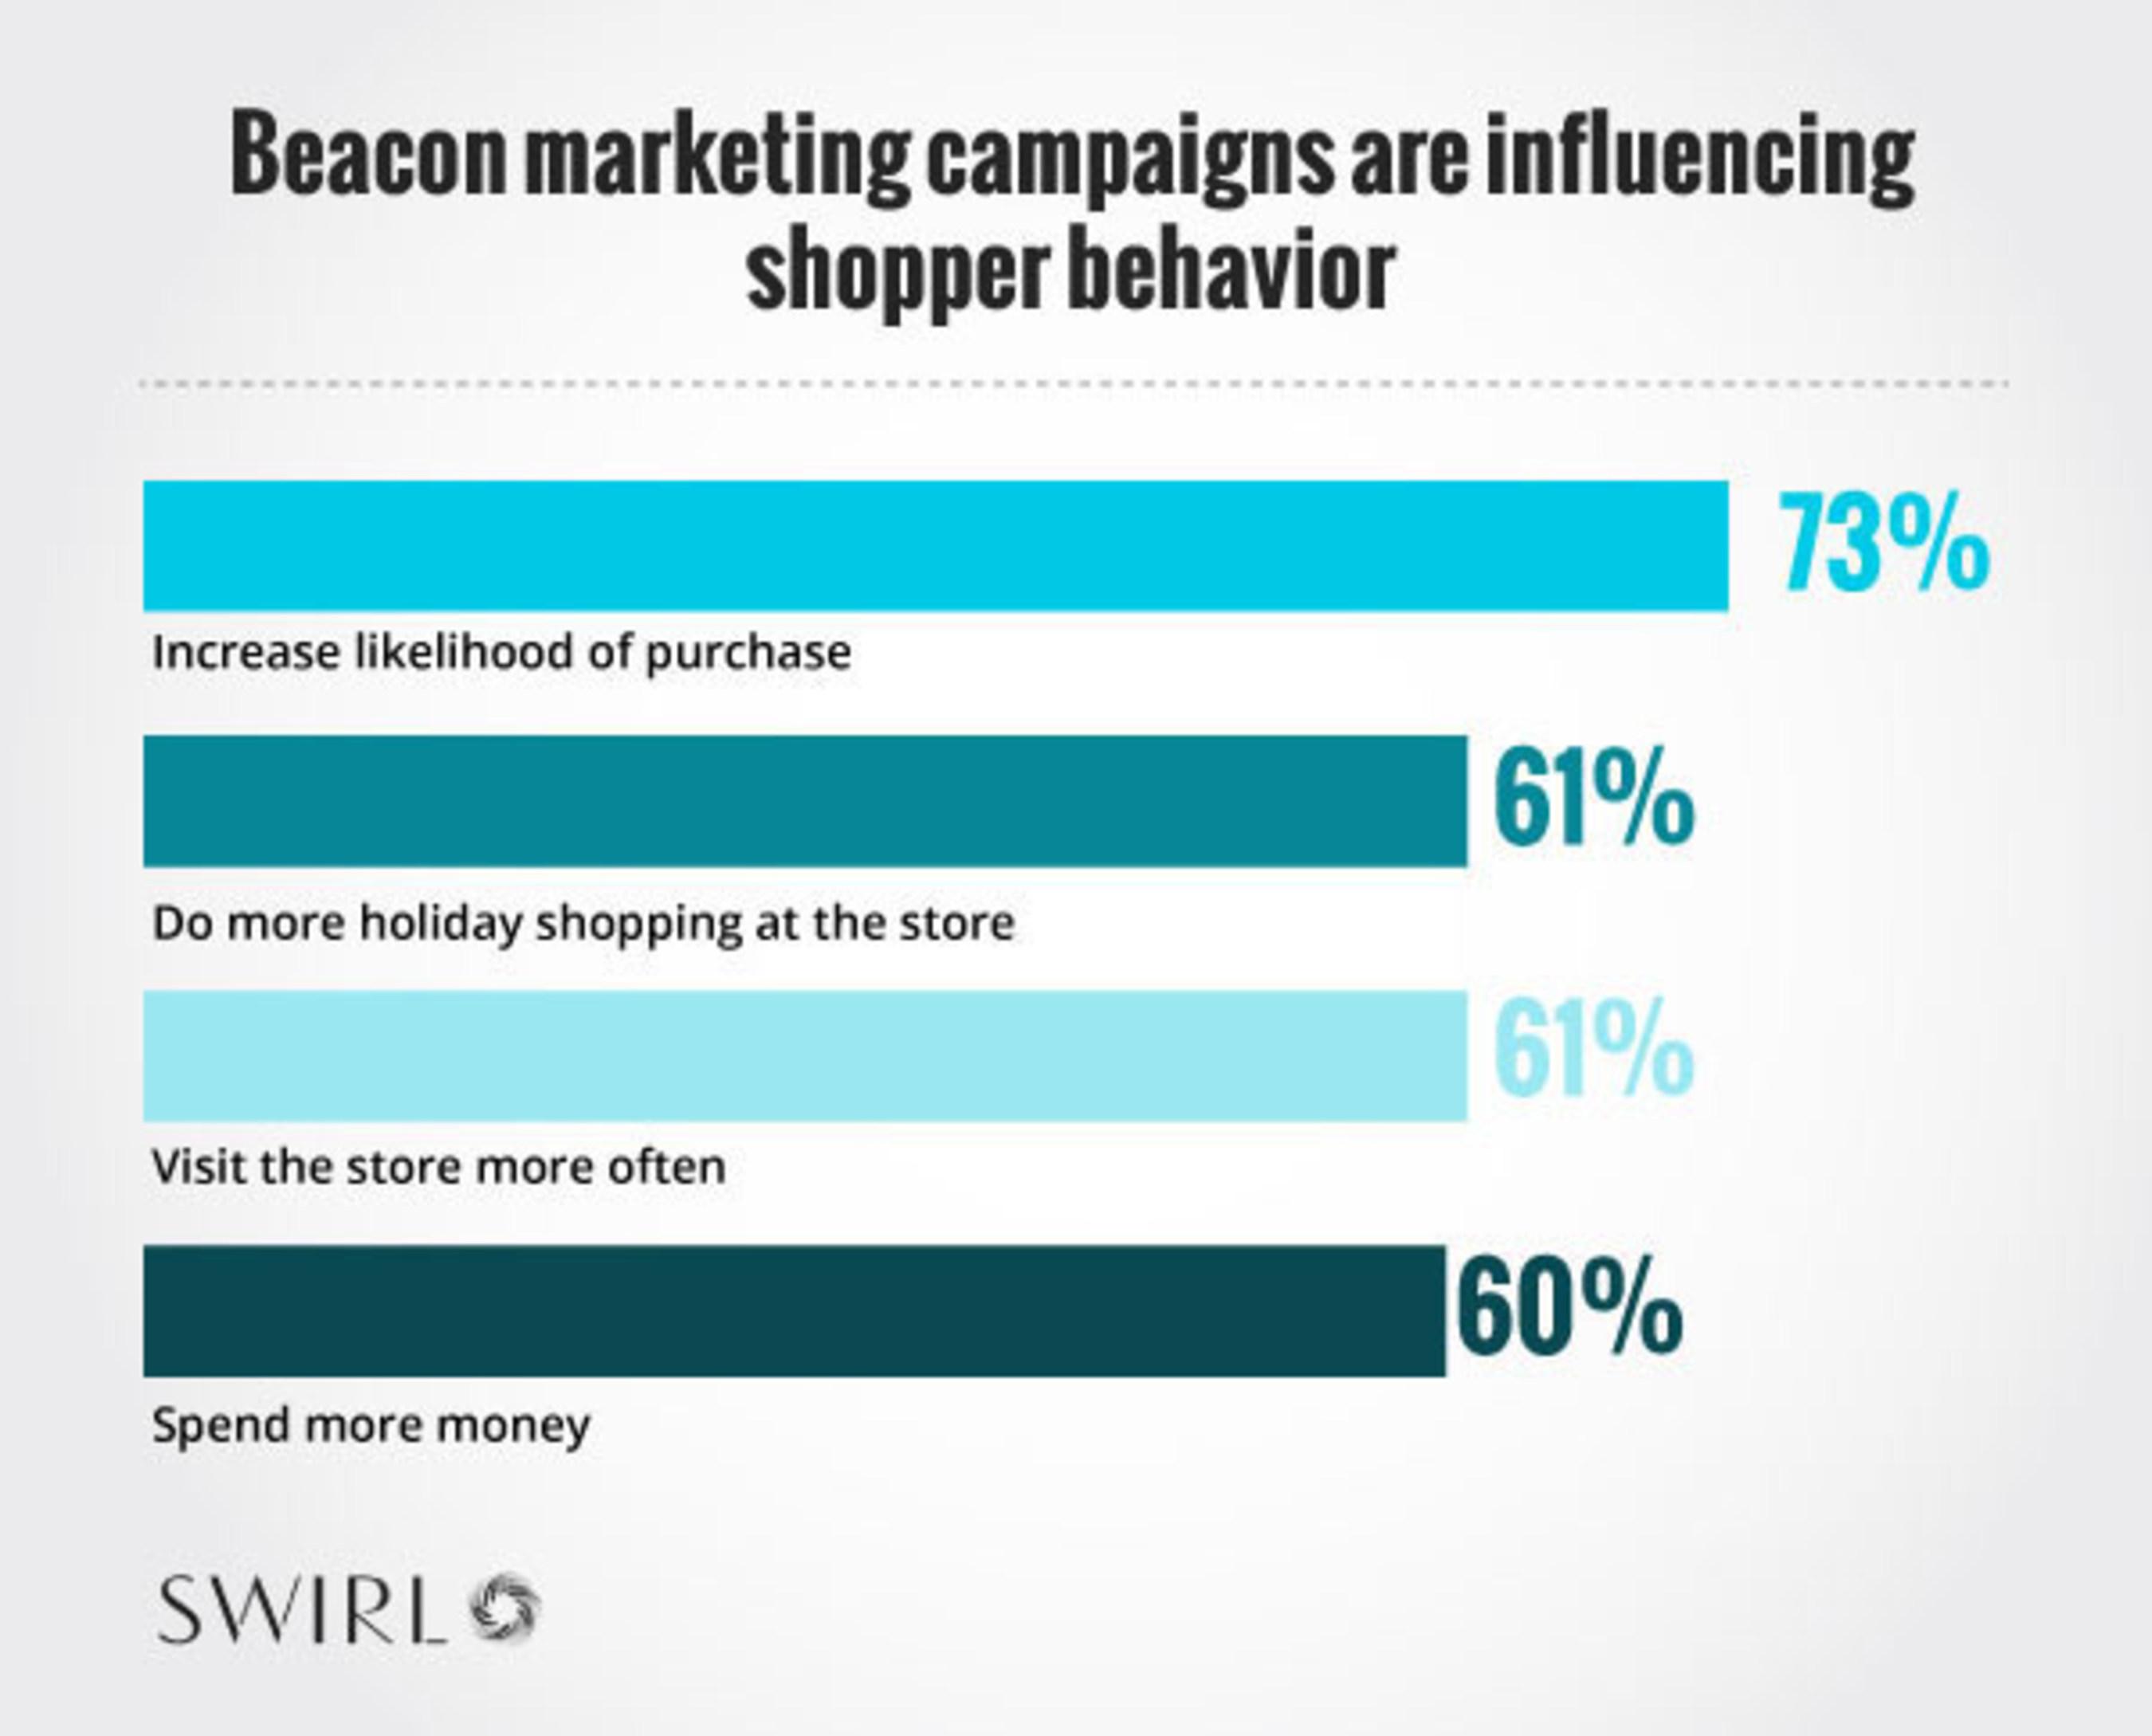 Beacon marketing campaigns are influencing shopper behavior